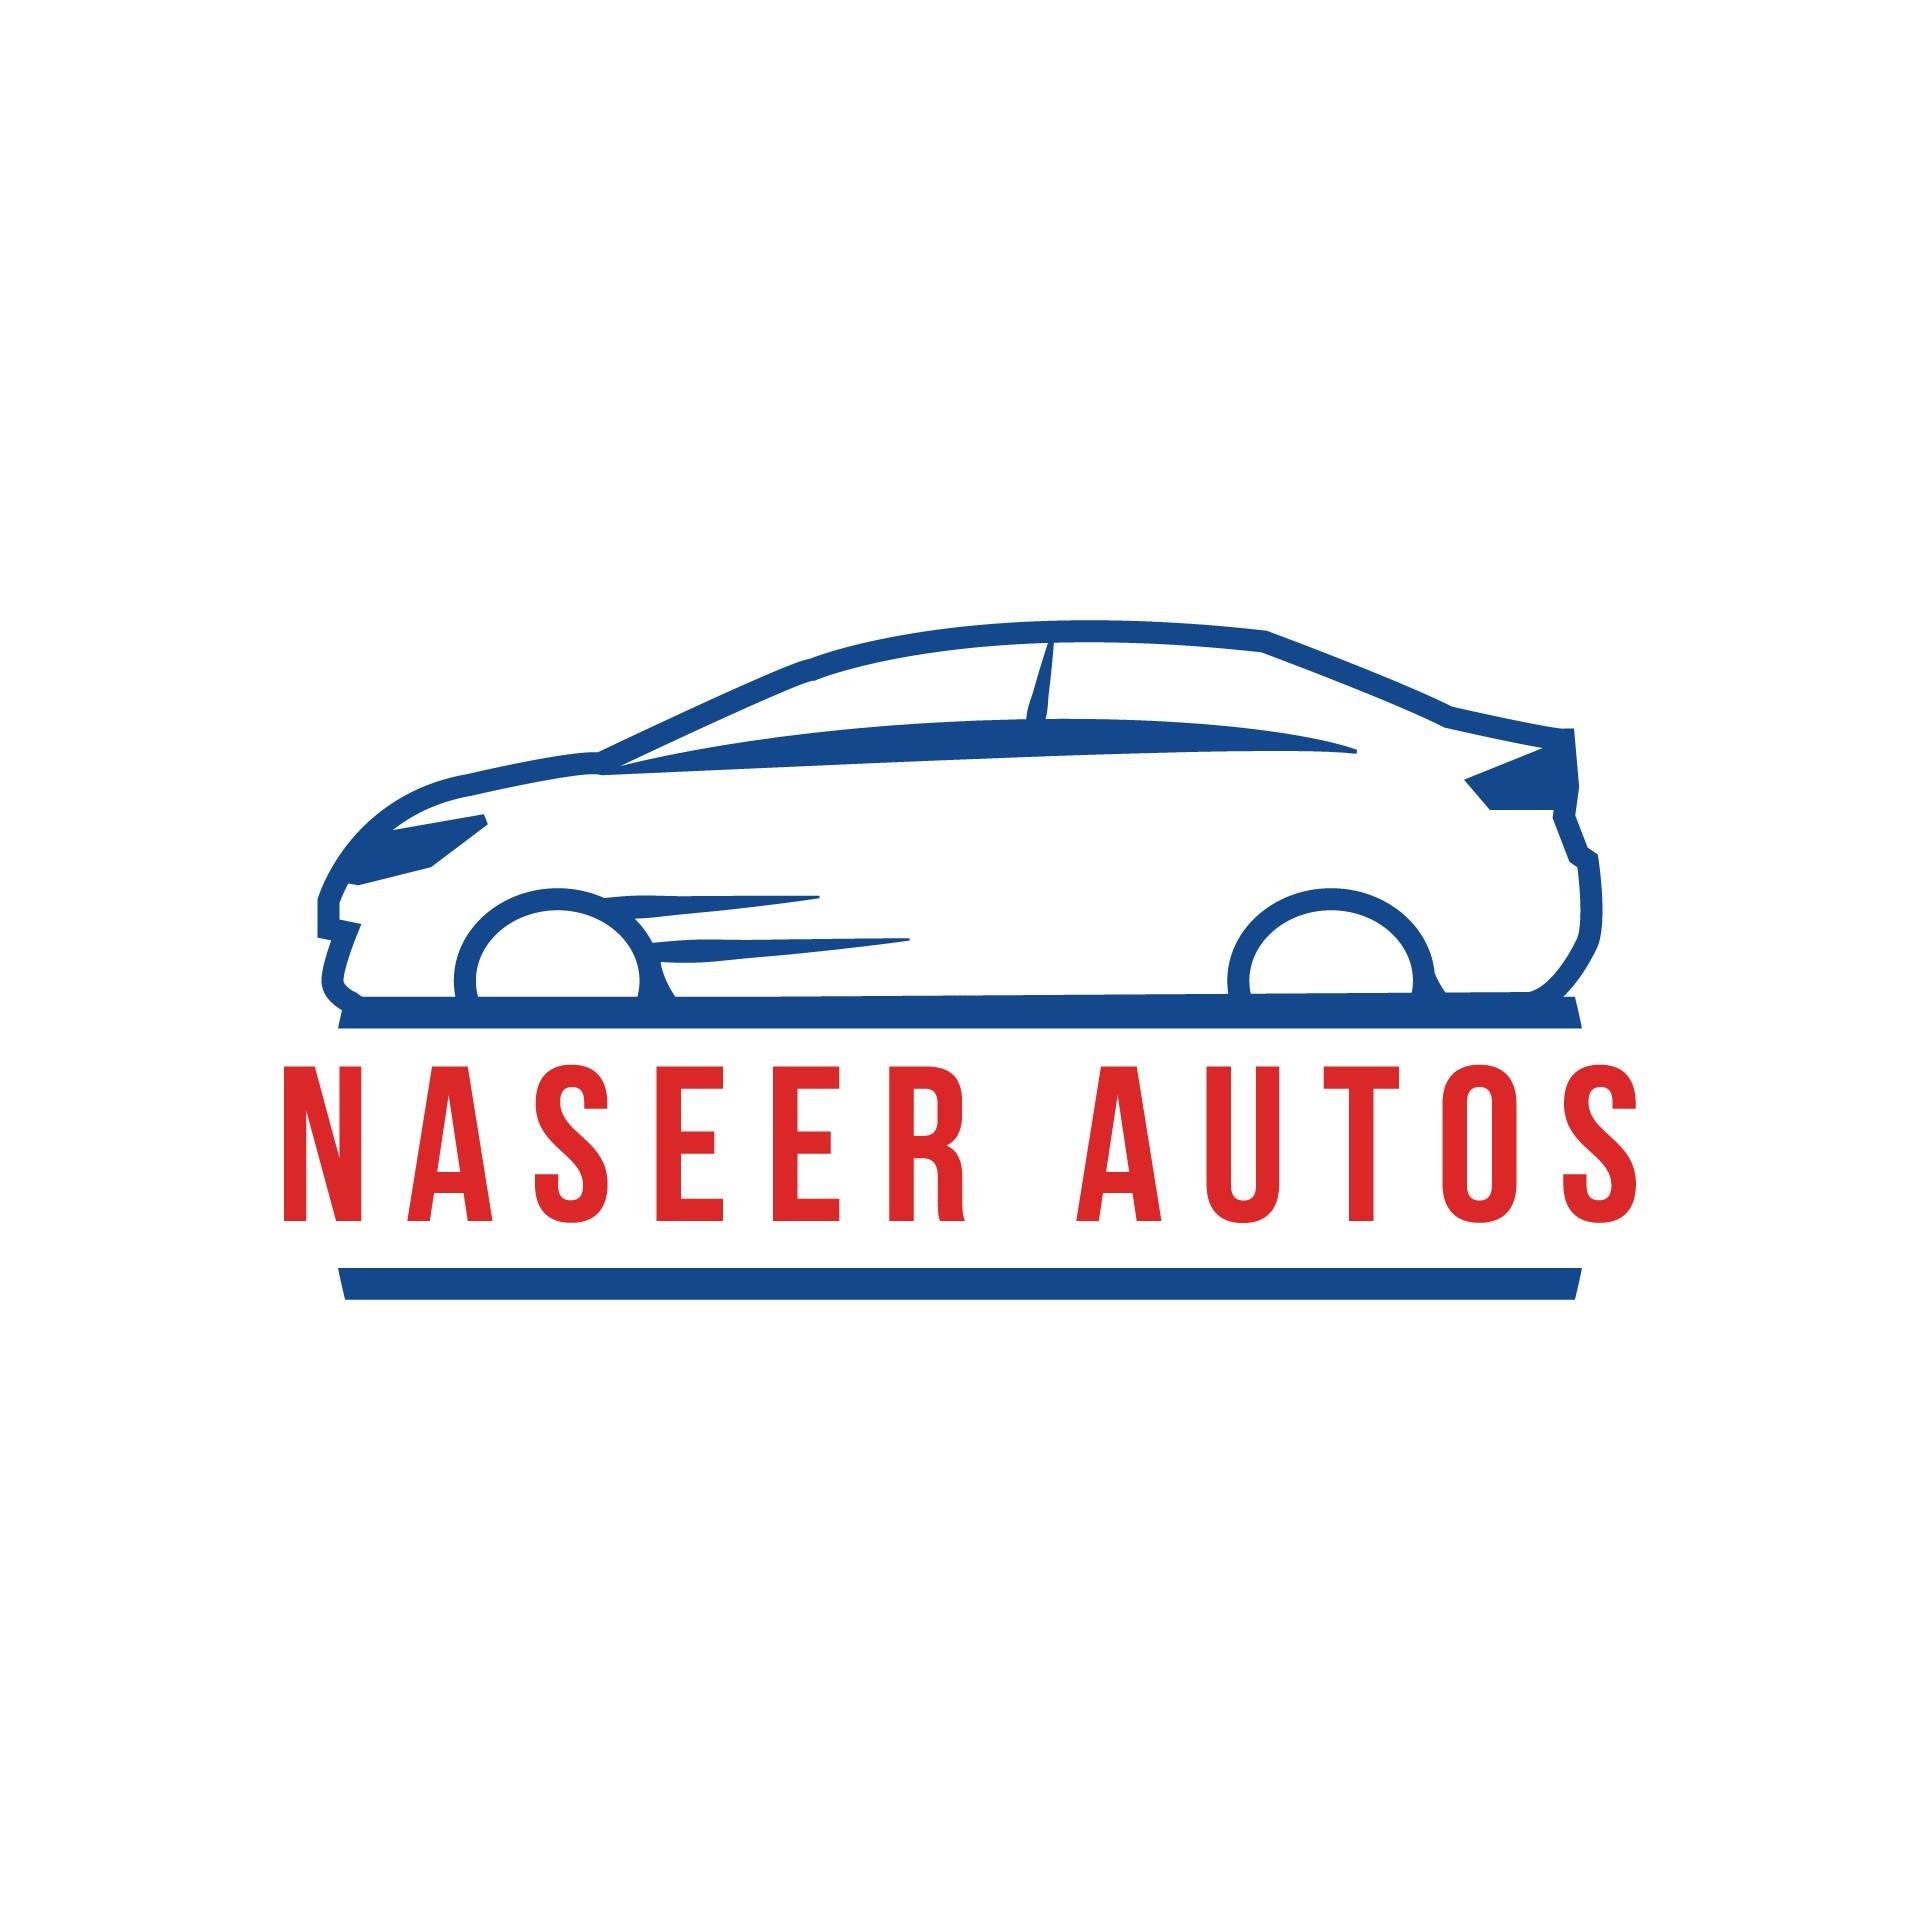 Naseer Autos   LinkedIn